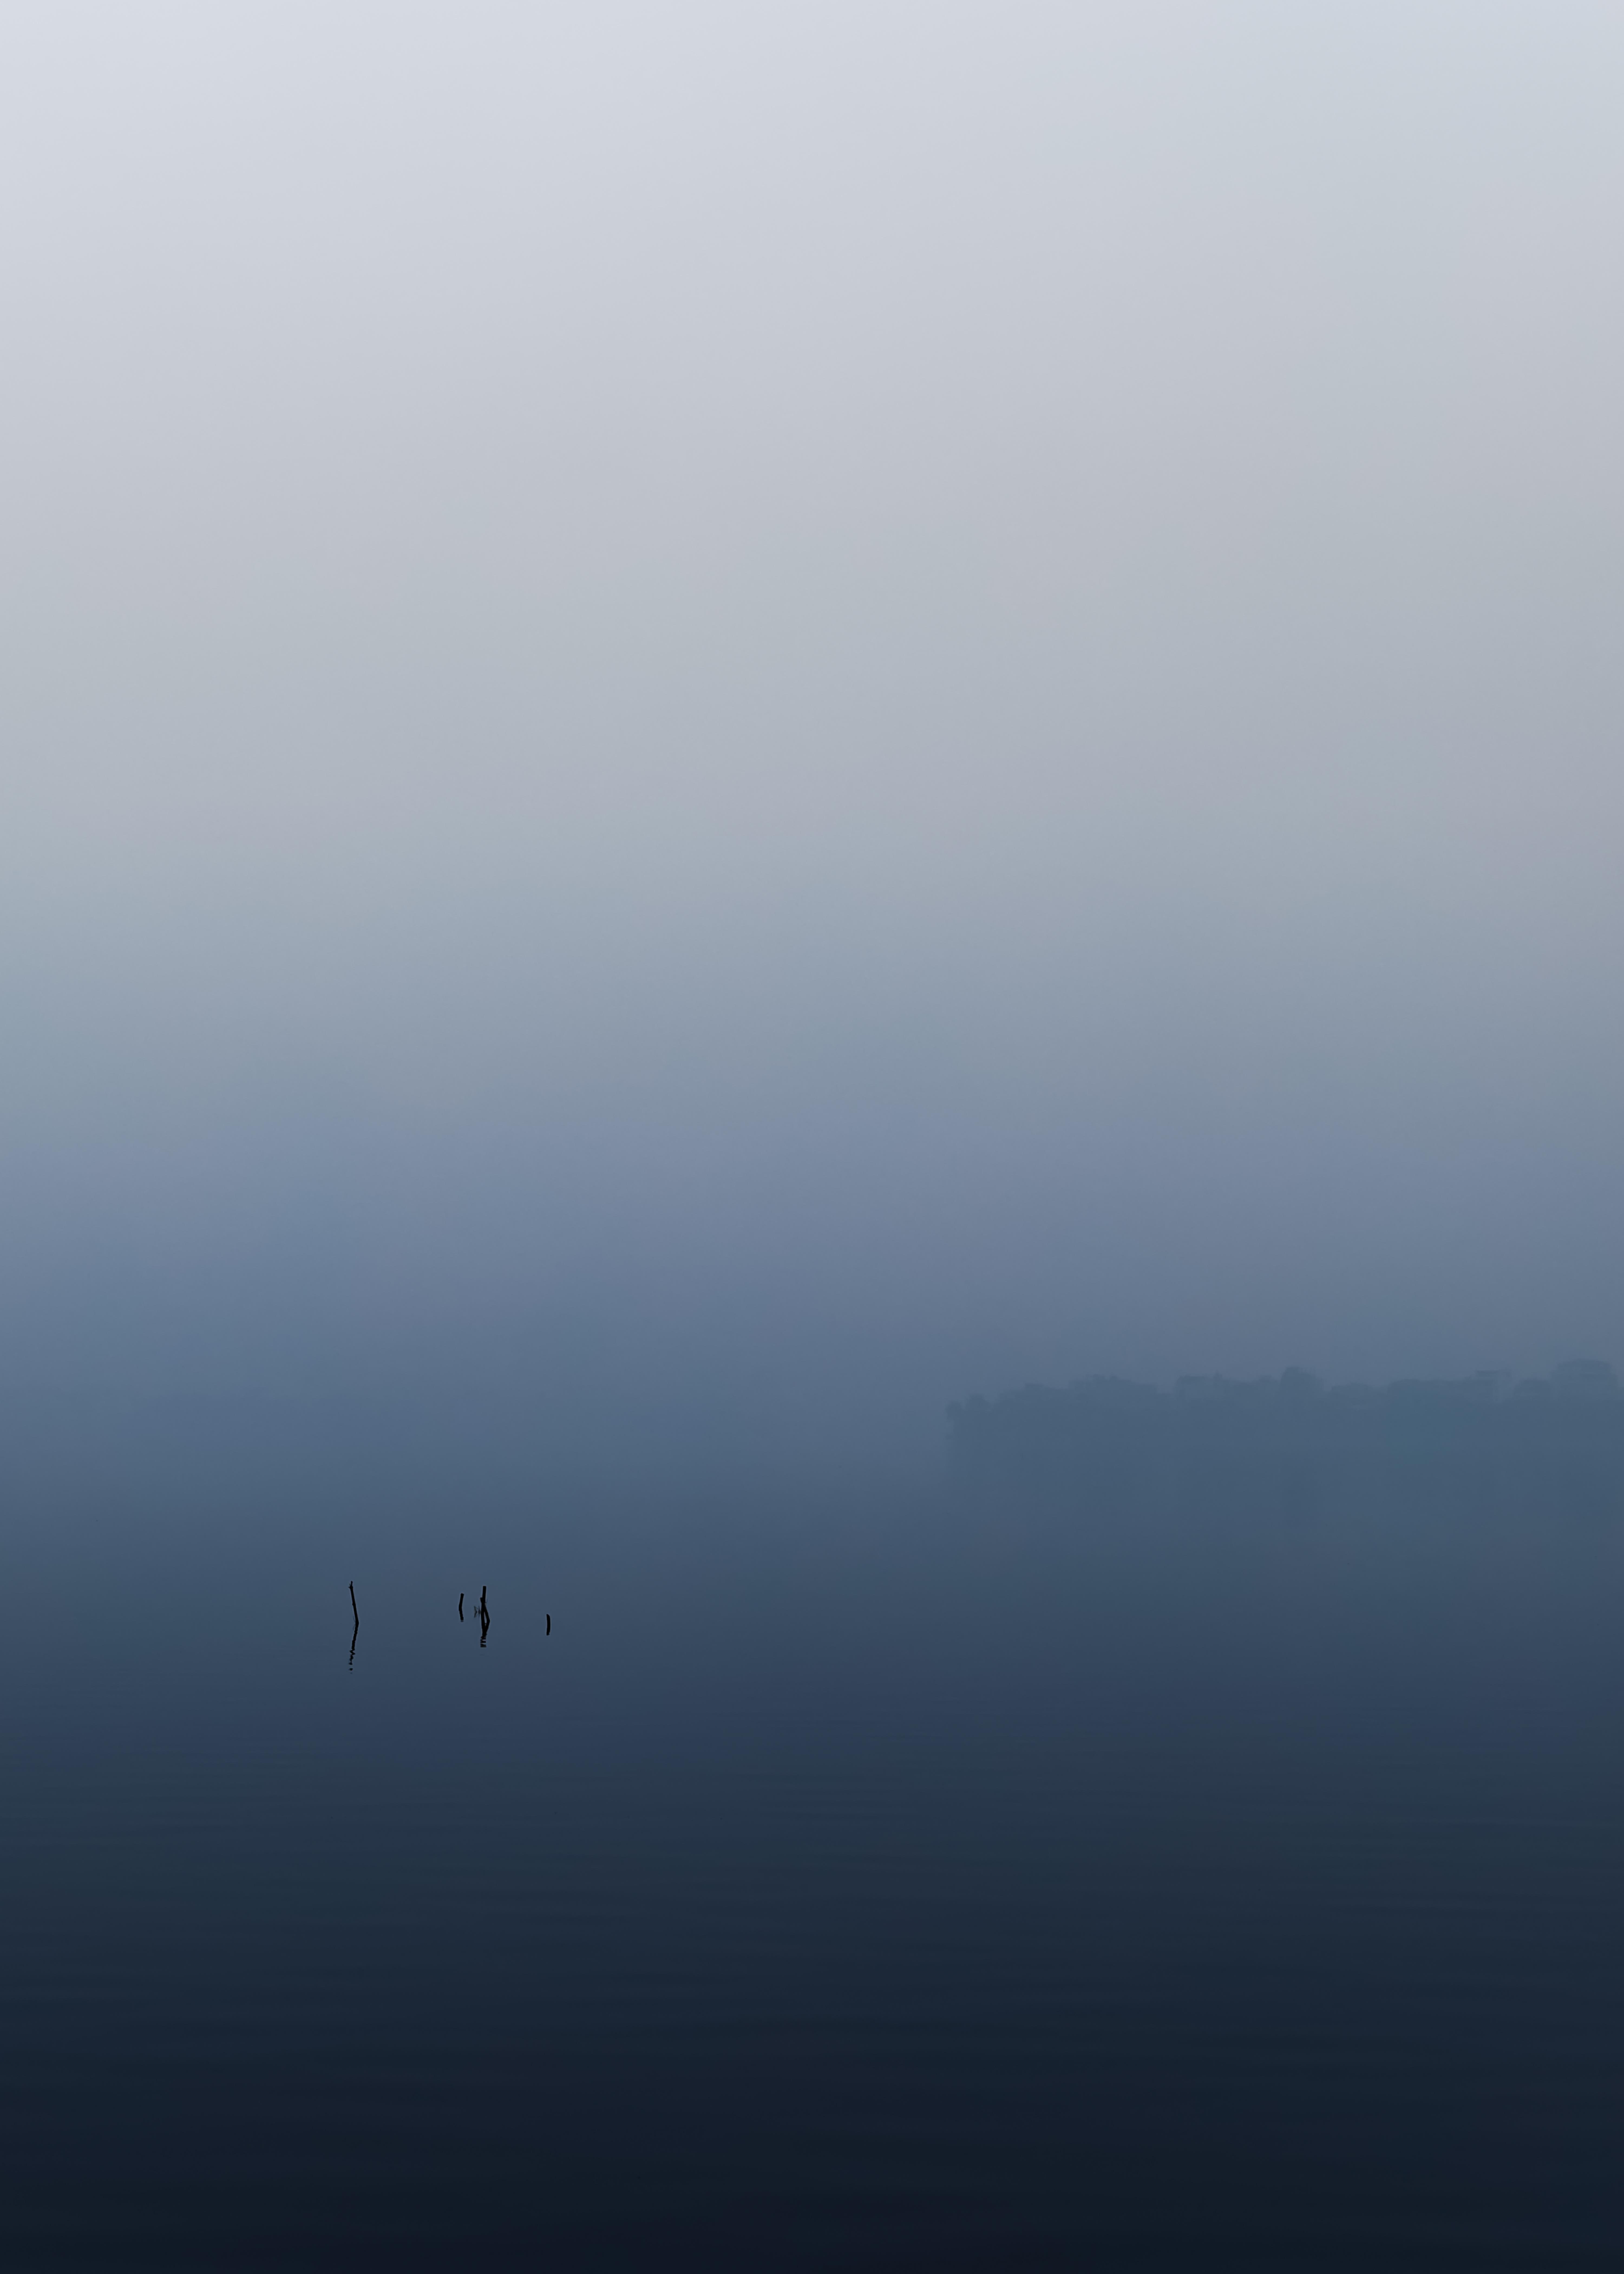 Sticks in Fog